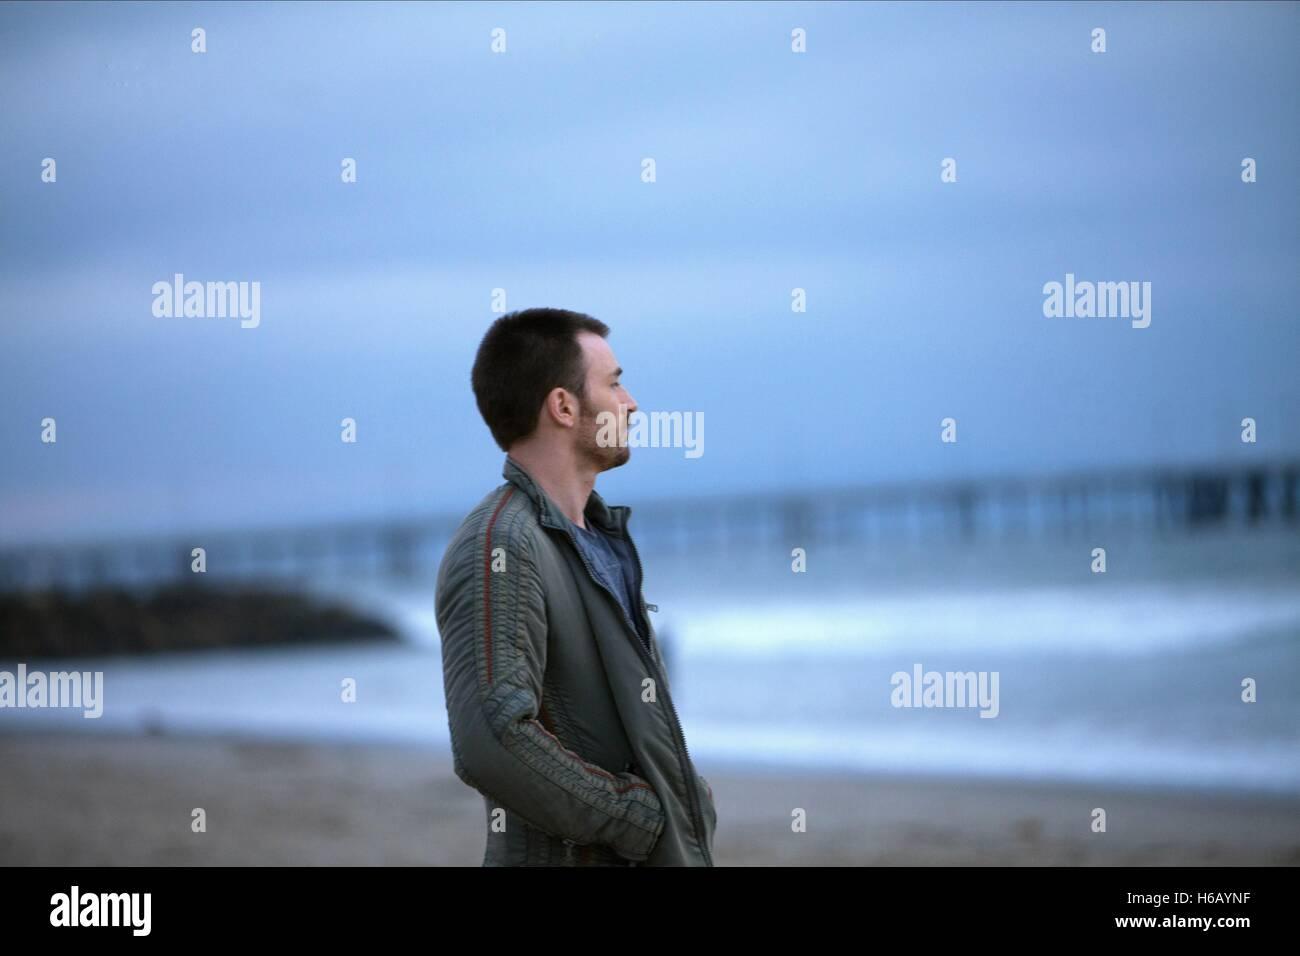 CHRIS EVANS PLAYING IT COOL (2014) - Stock Image